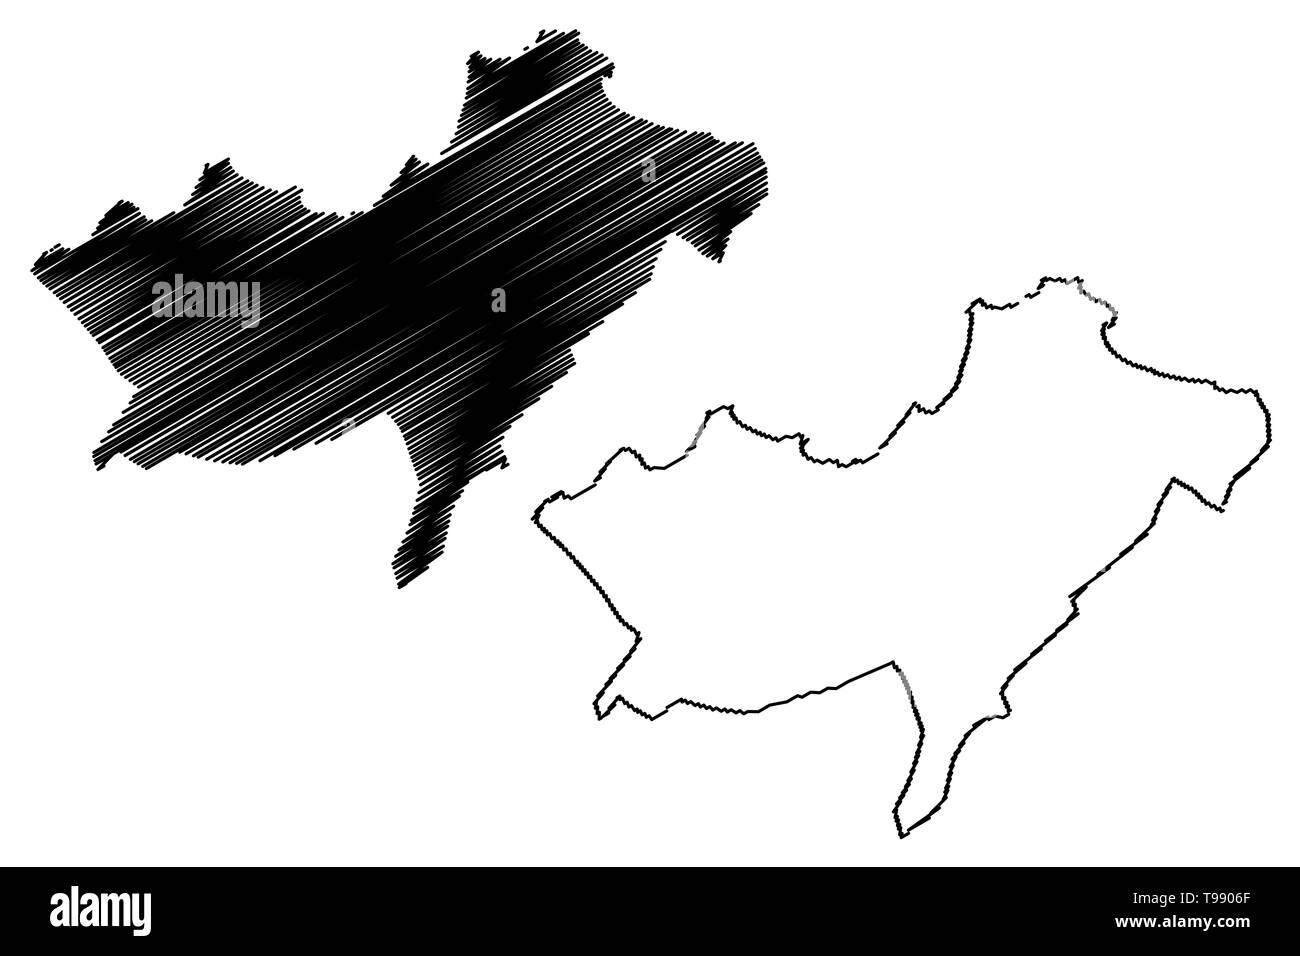 Oran Province (Provinces of Algeria, Peoples Democratic Republic of Algeria) map vector illustration, scribble sketch Oran map - Stock Image